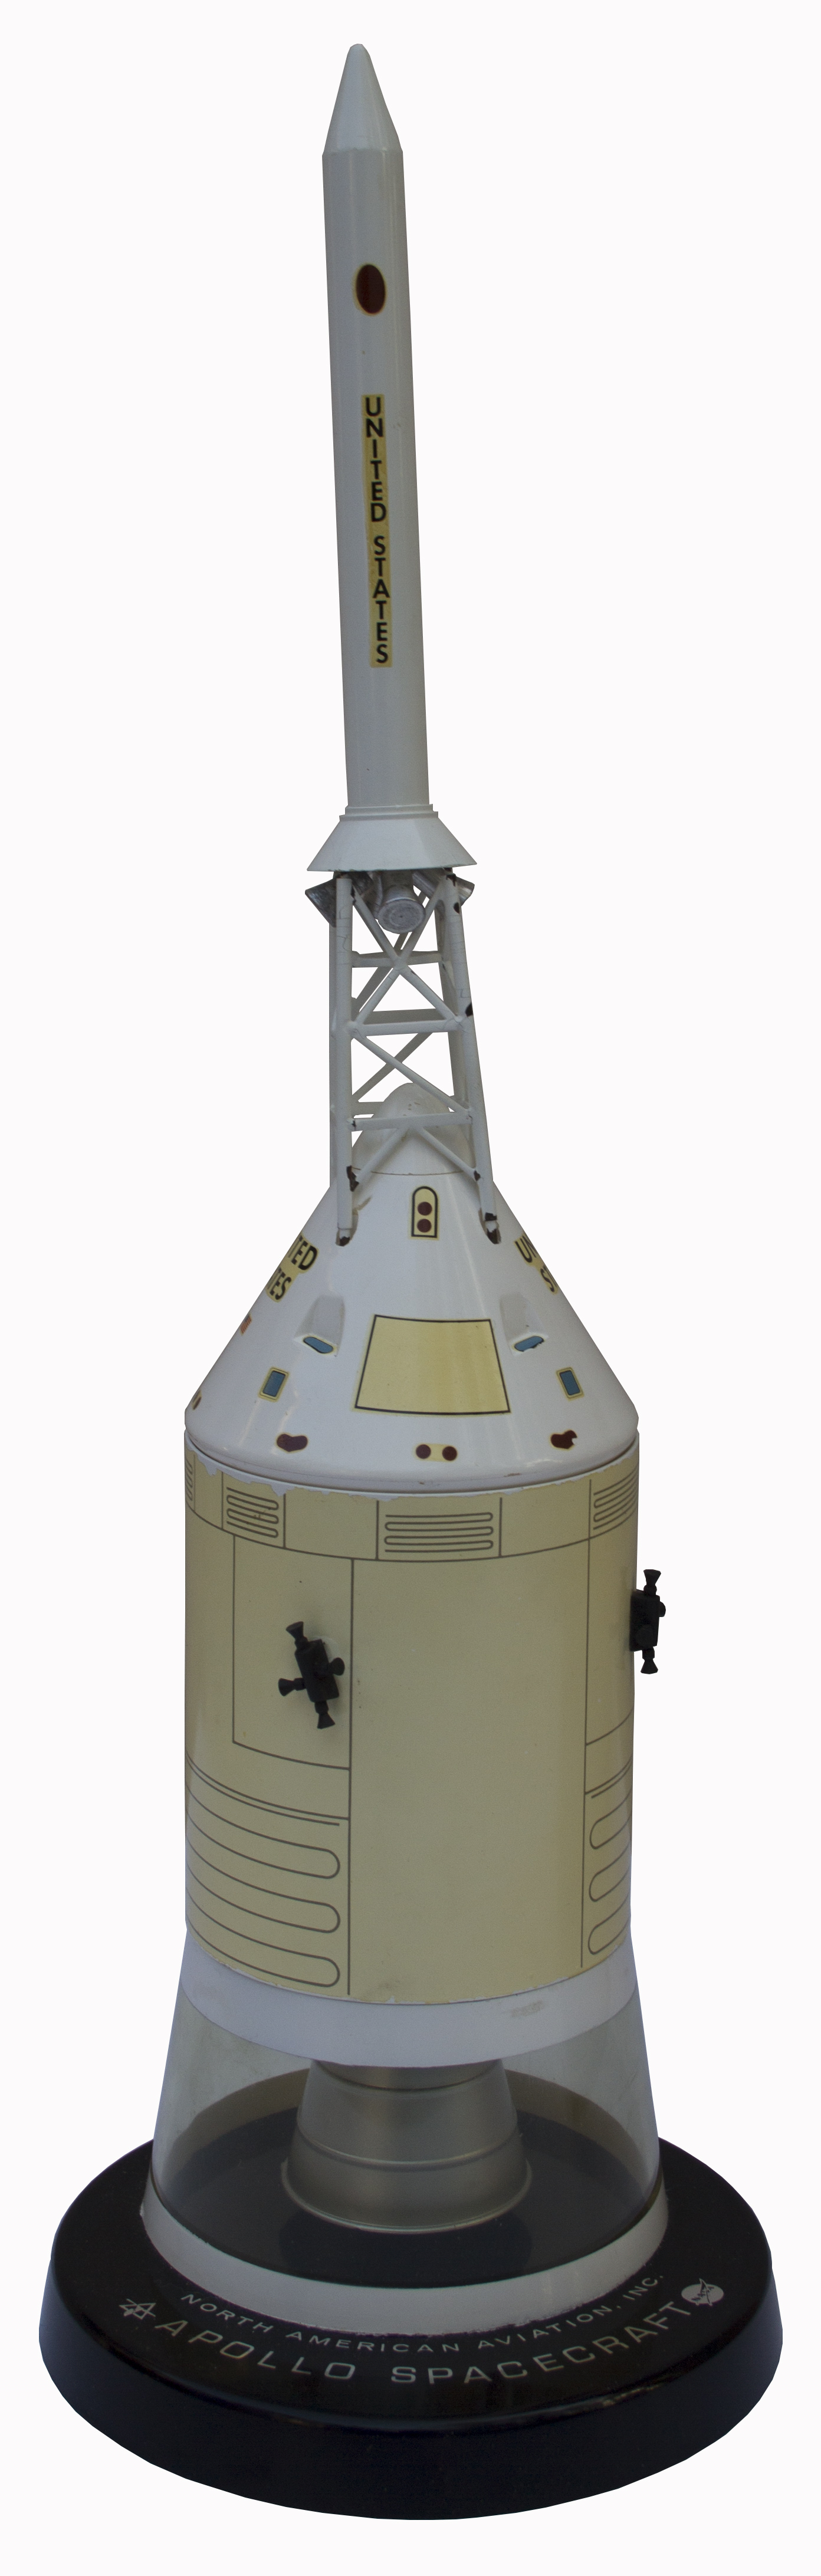 apollo spacecraft - photo #43